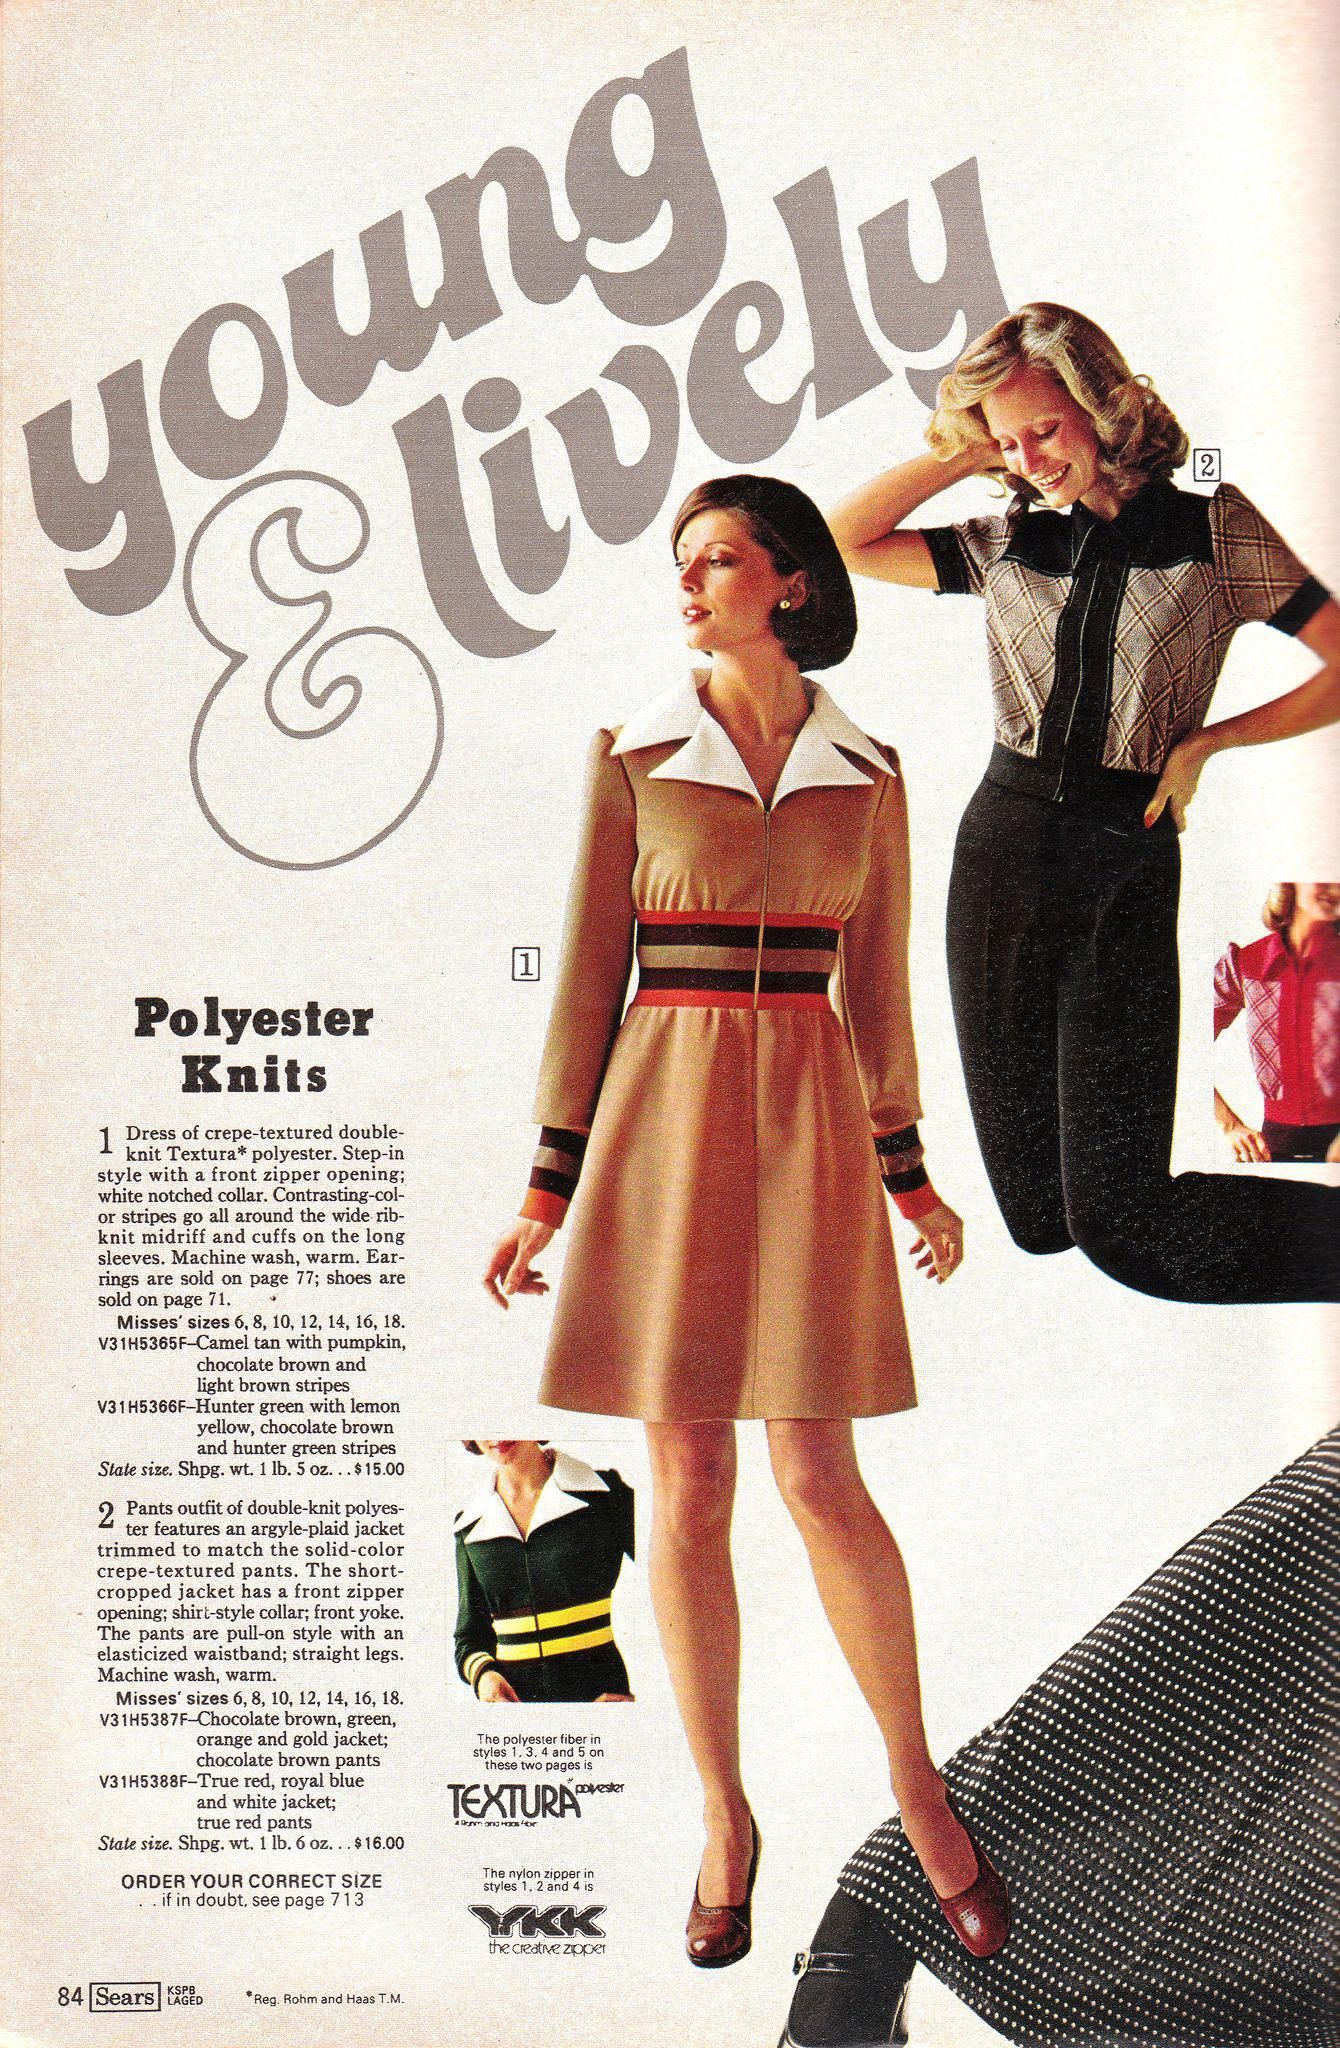 Jlindebergwomensgolfclothing j lindeberg womens golf clothing